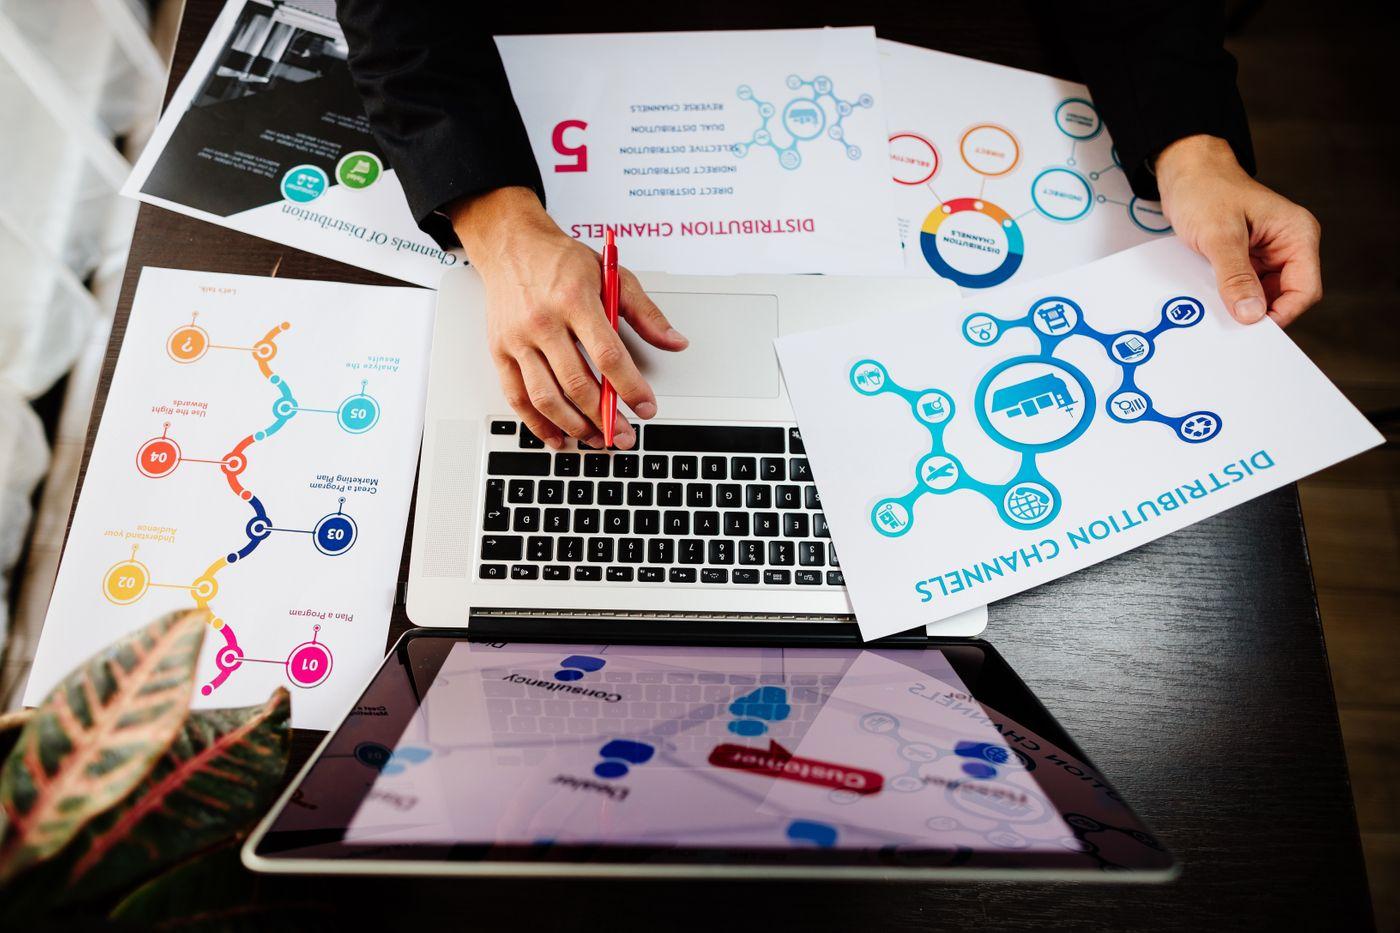 marketing-manager-making-marketing-distribution-ch-SBX94N8.jpg